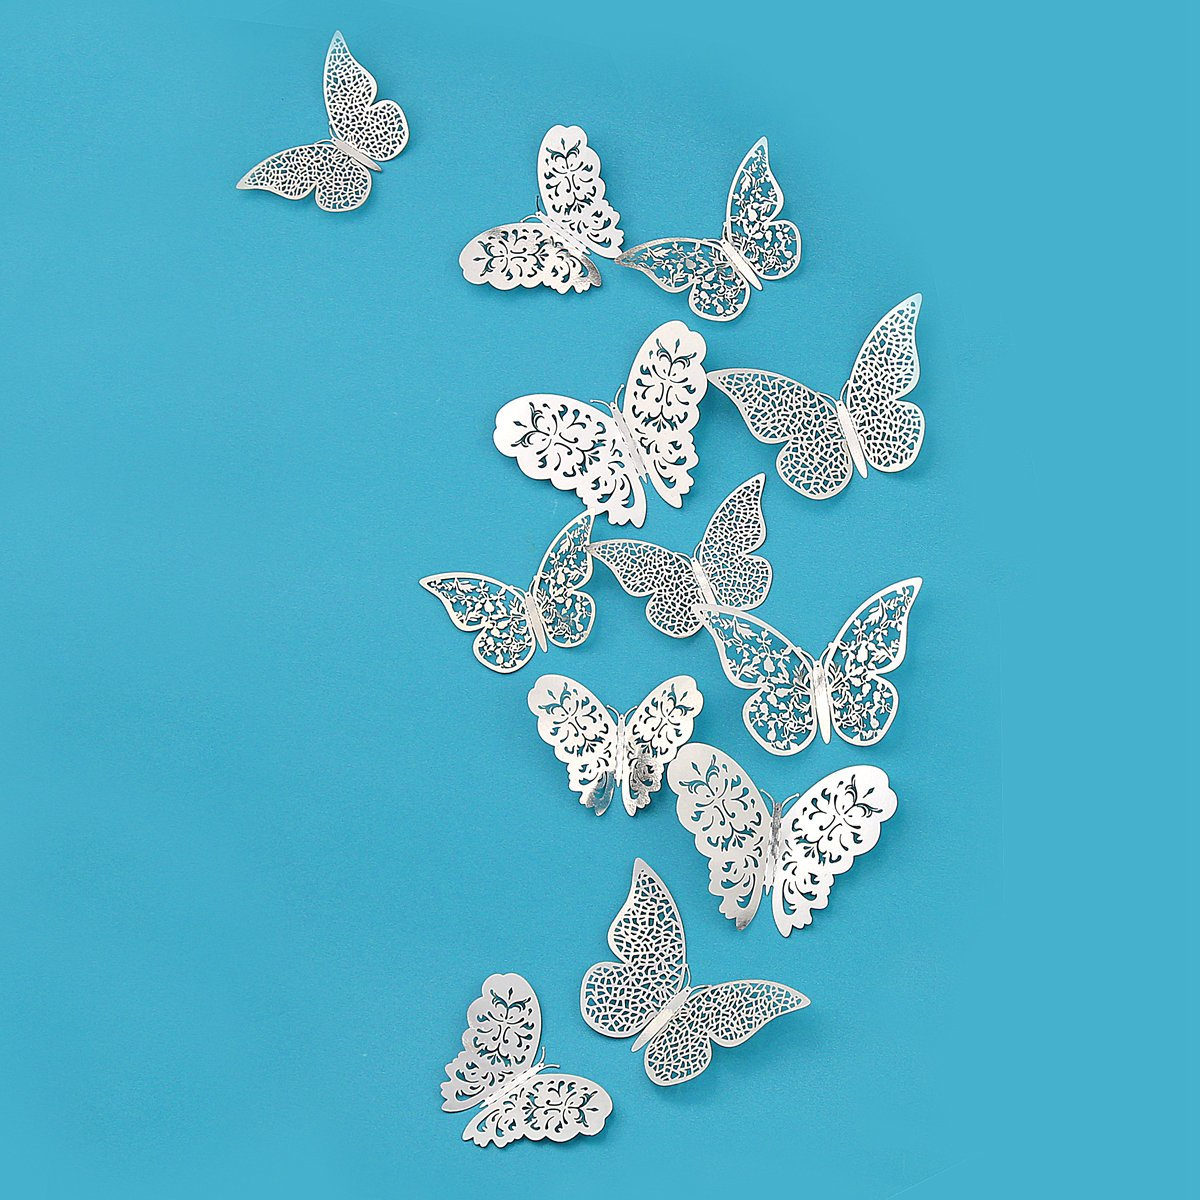 PinkBlume Silver Butterfly Decorations,3D Wall Decals,Metallic Art Sticker,DIY/Man-made/Removable/Decorative Paper Murals for Home,Bathroom,Livingroom,Kids/Girls Bedroom,Nursey,Party Décor.(36 PCS)